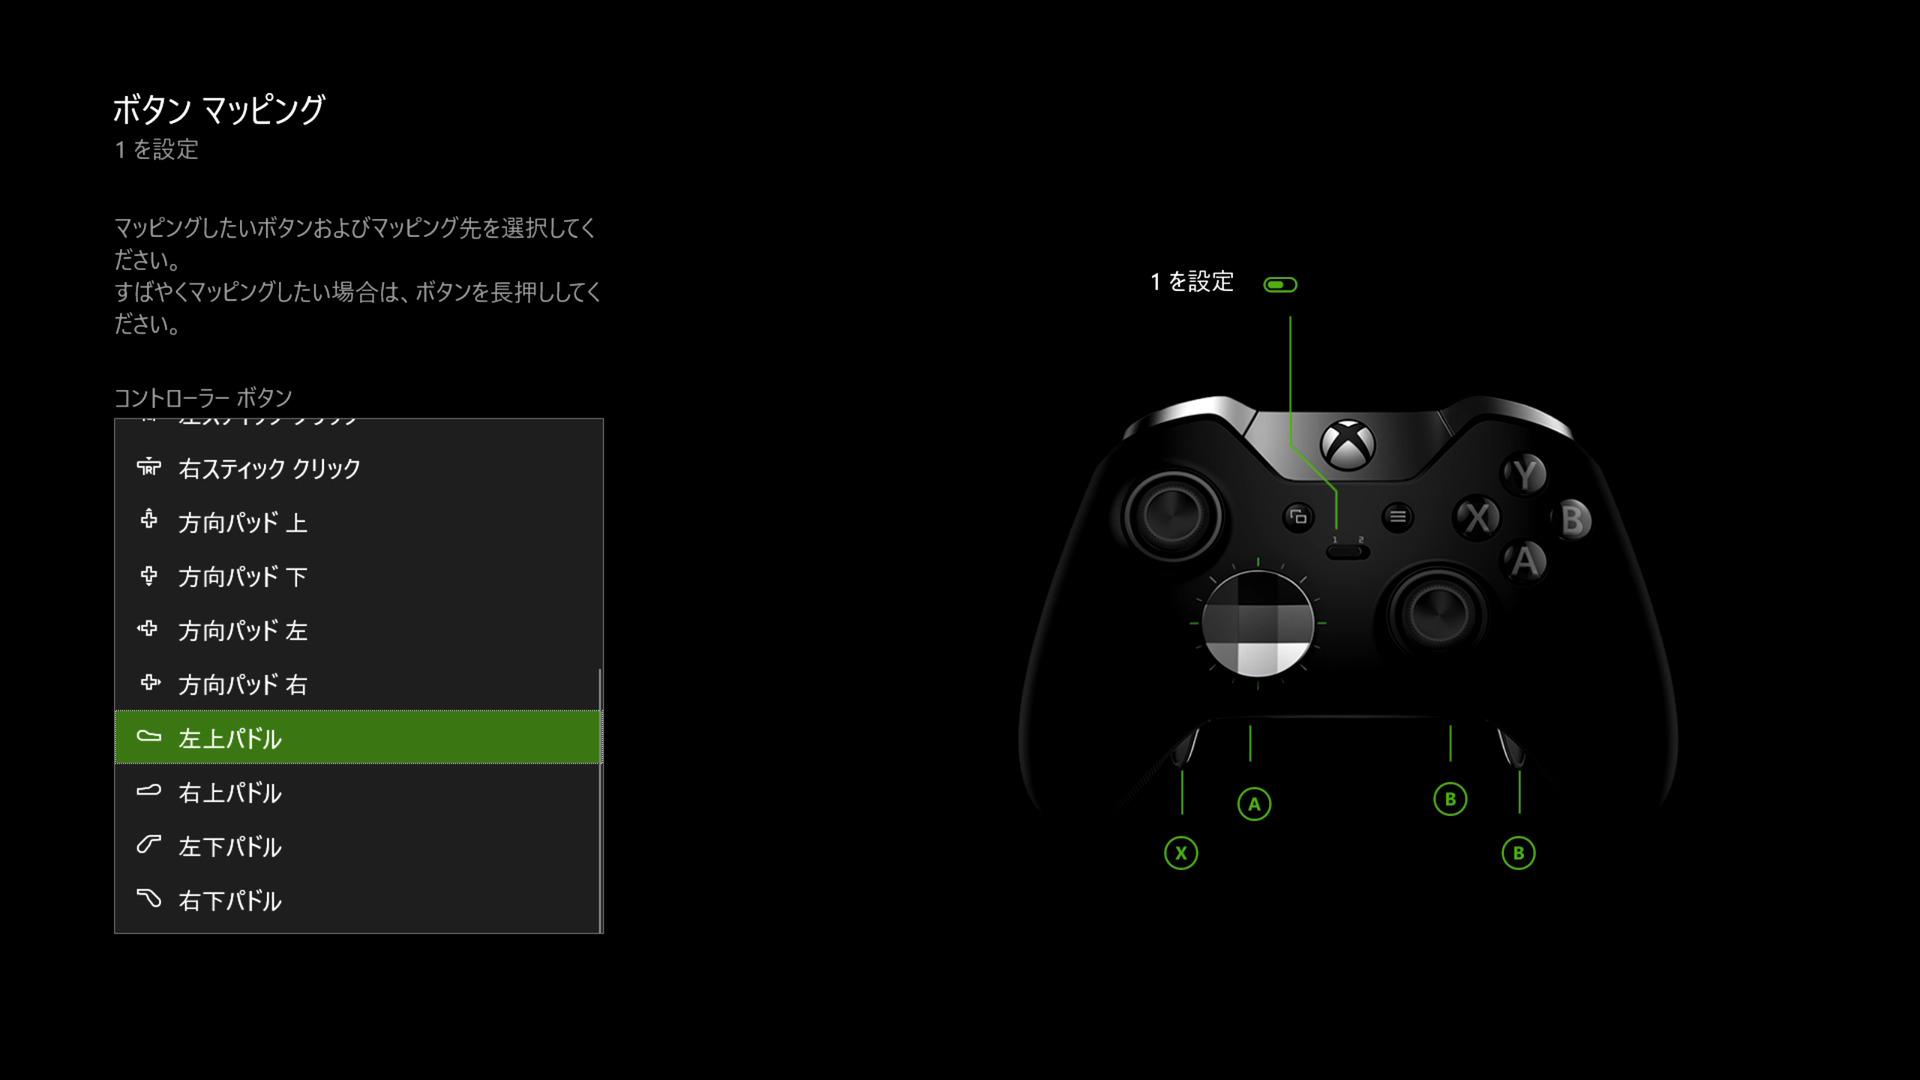 「Xbox アクセサリー」でのボタンマッピング画面